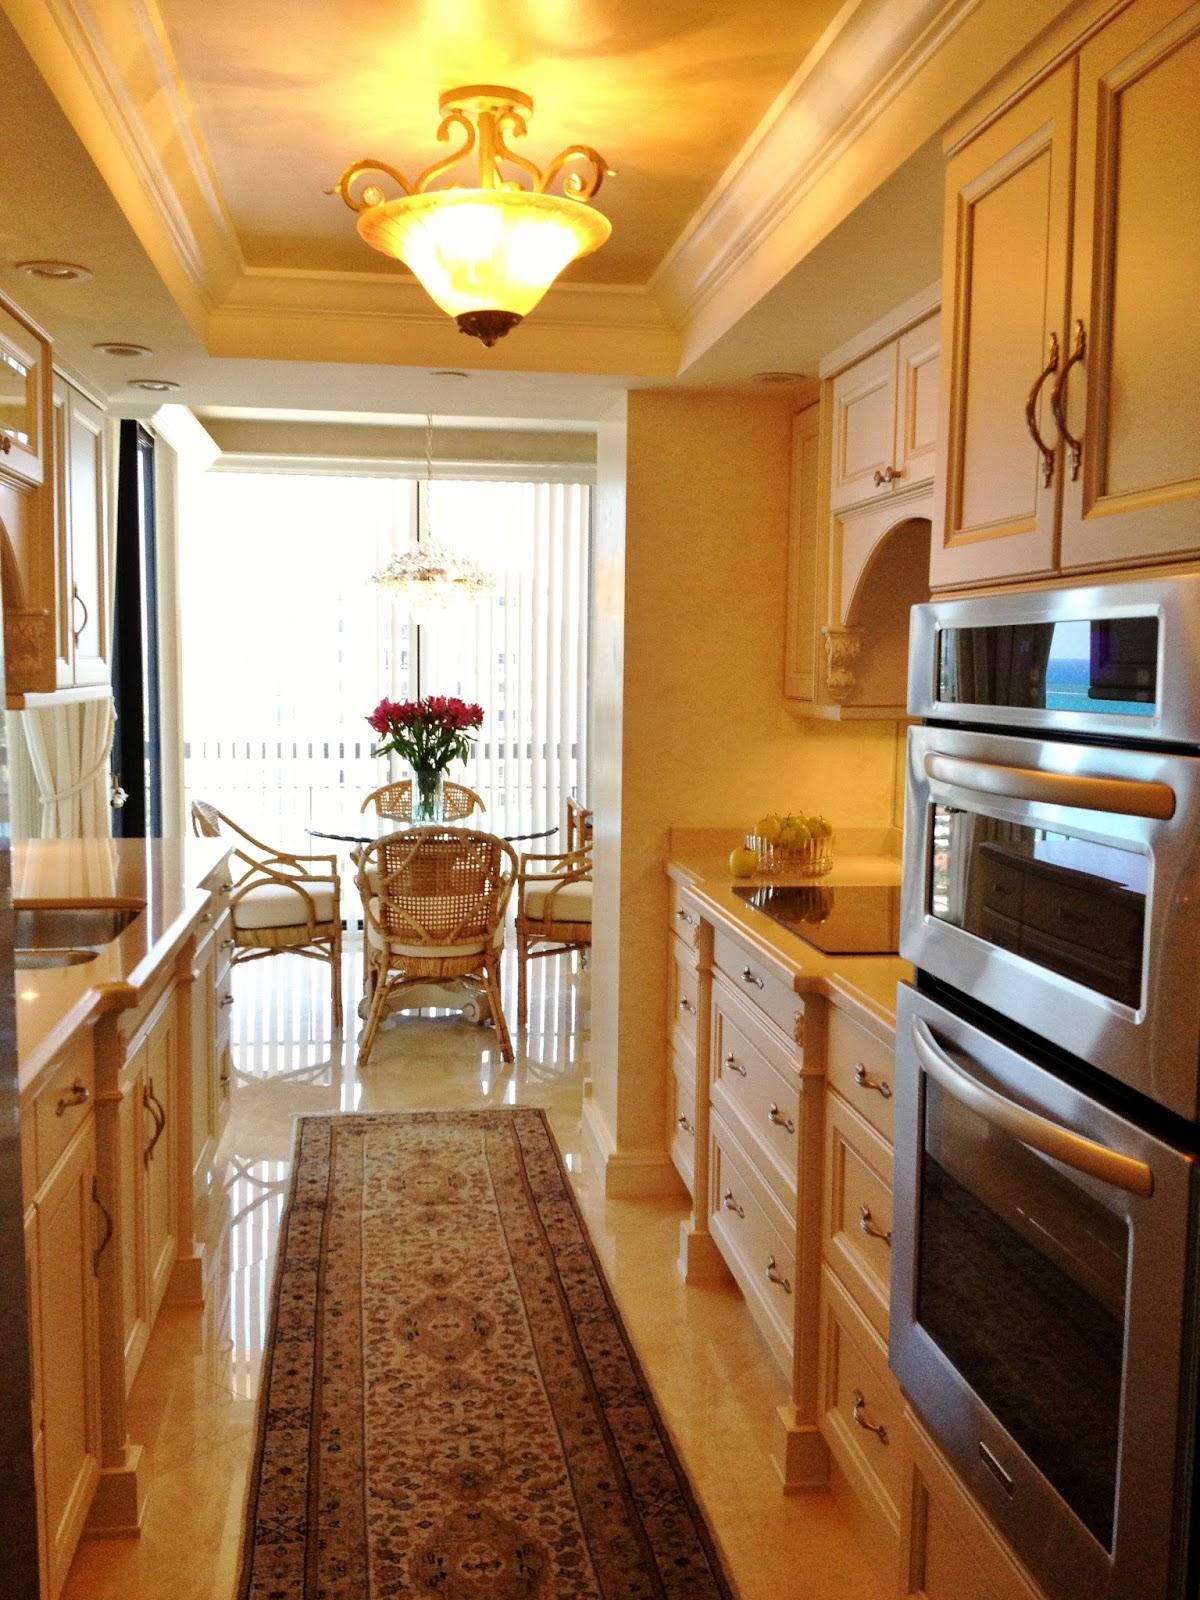 Elegant kitchen small space